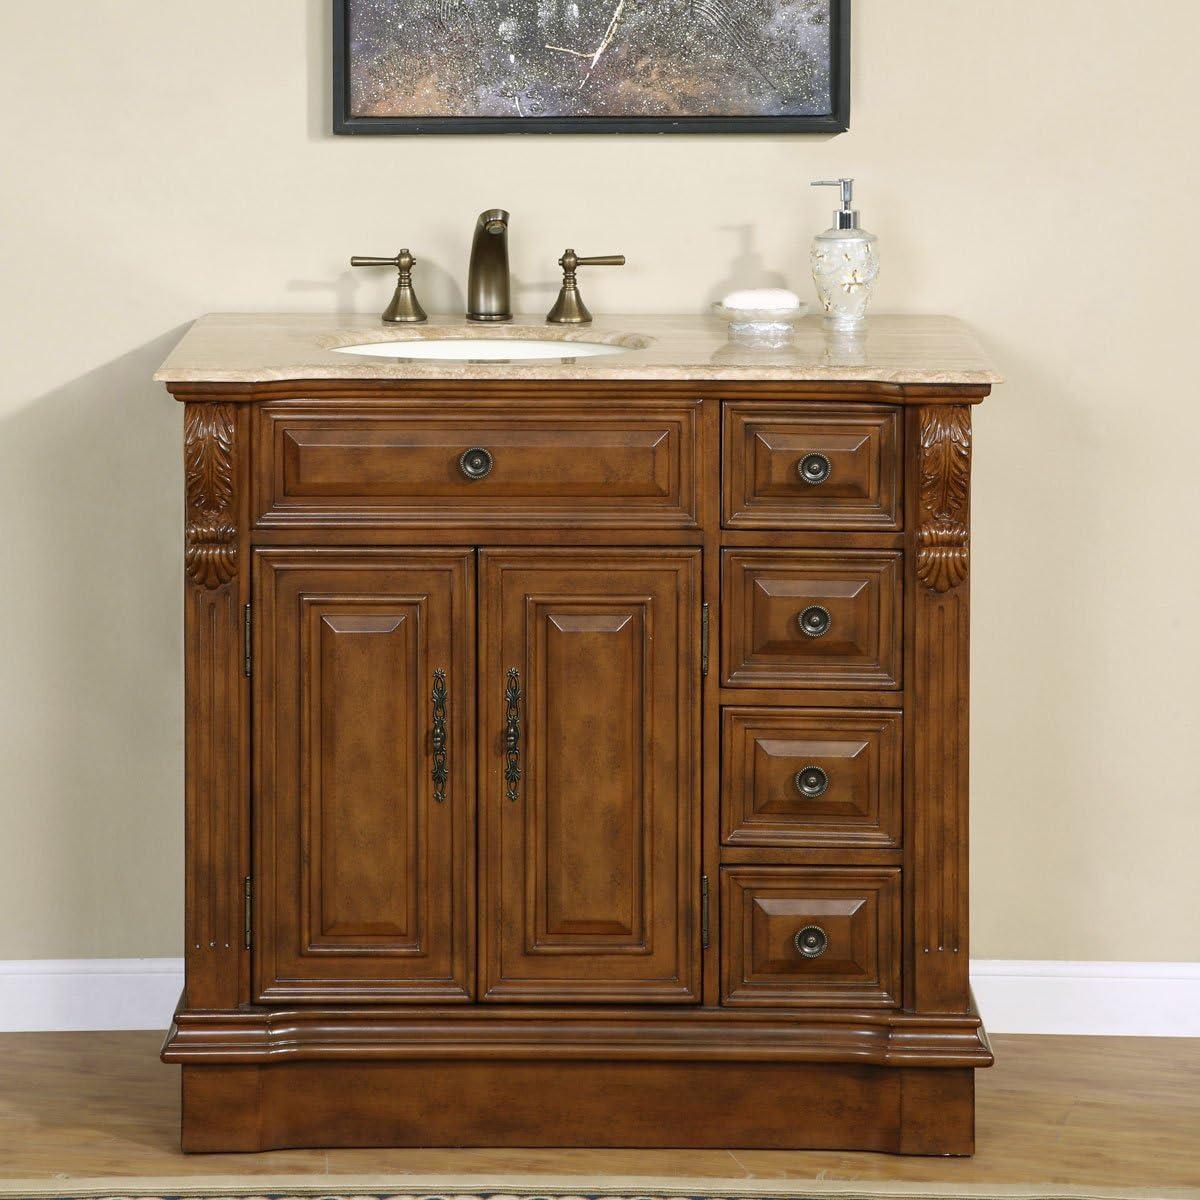 Silkroad Exclusive HYP-0904-T-UIC-38-L Off Center Single Left Sink Bathroom Vanity with Furniture Cabinet, 38 , Medium Wood